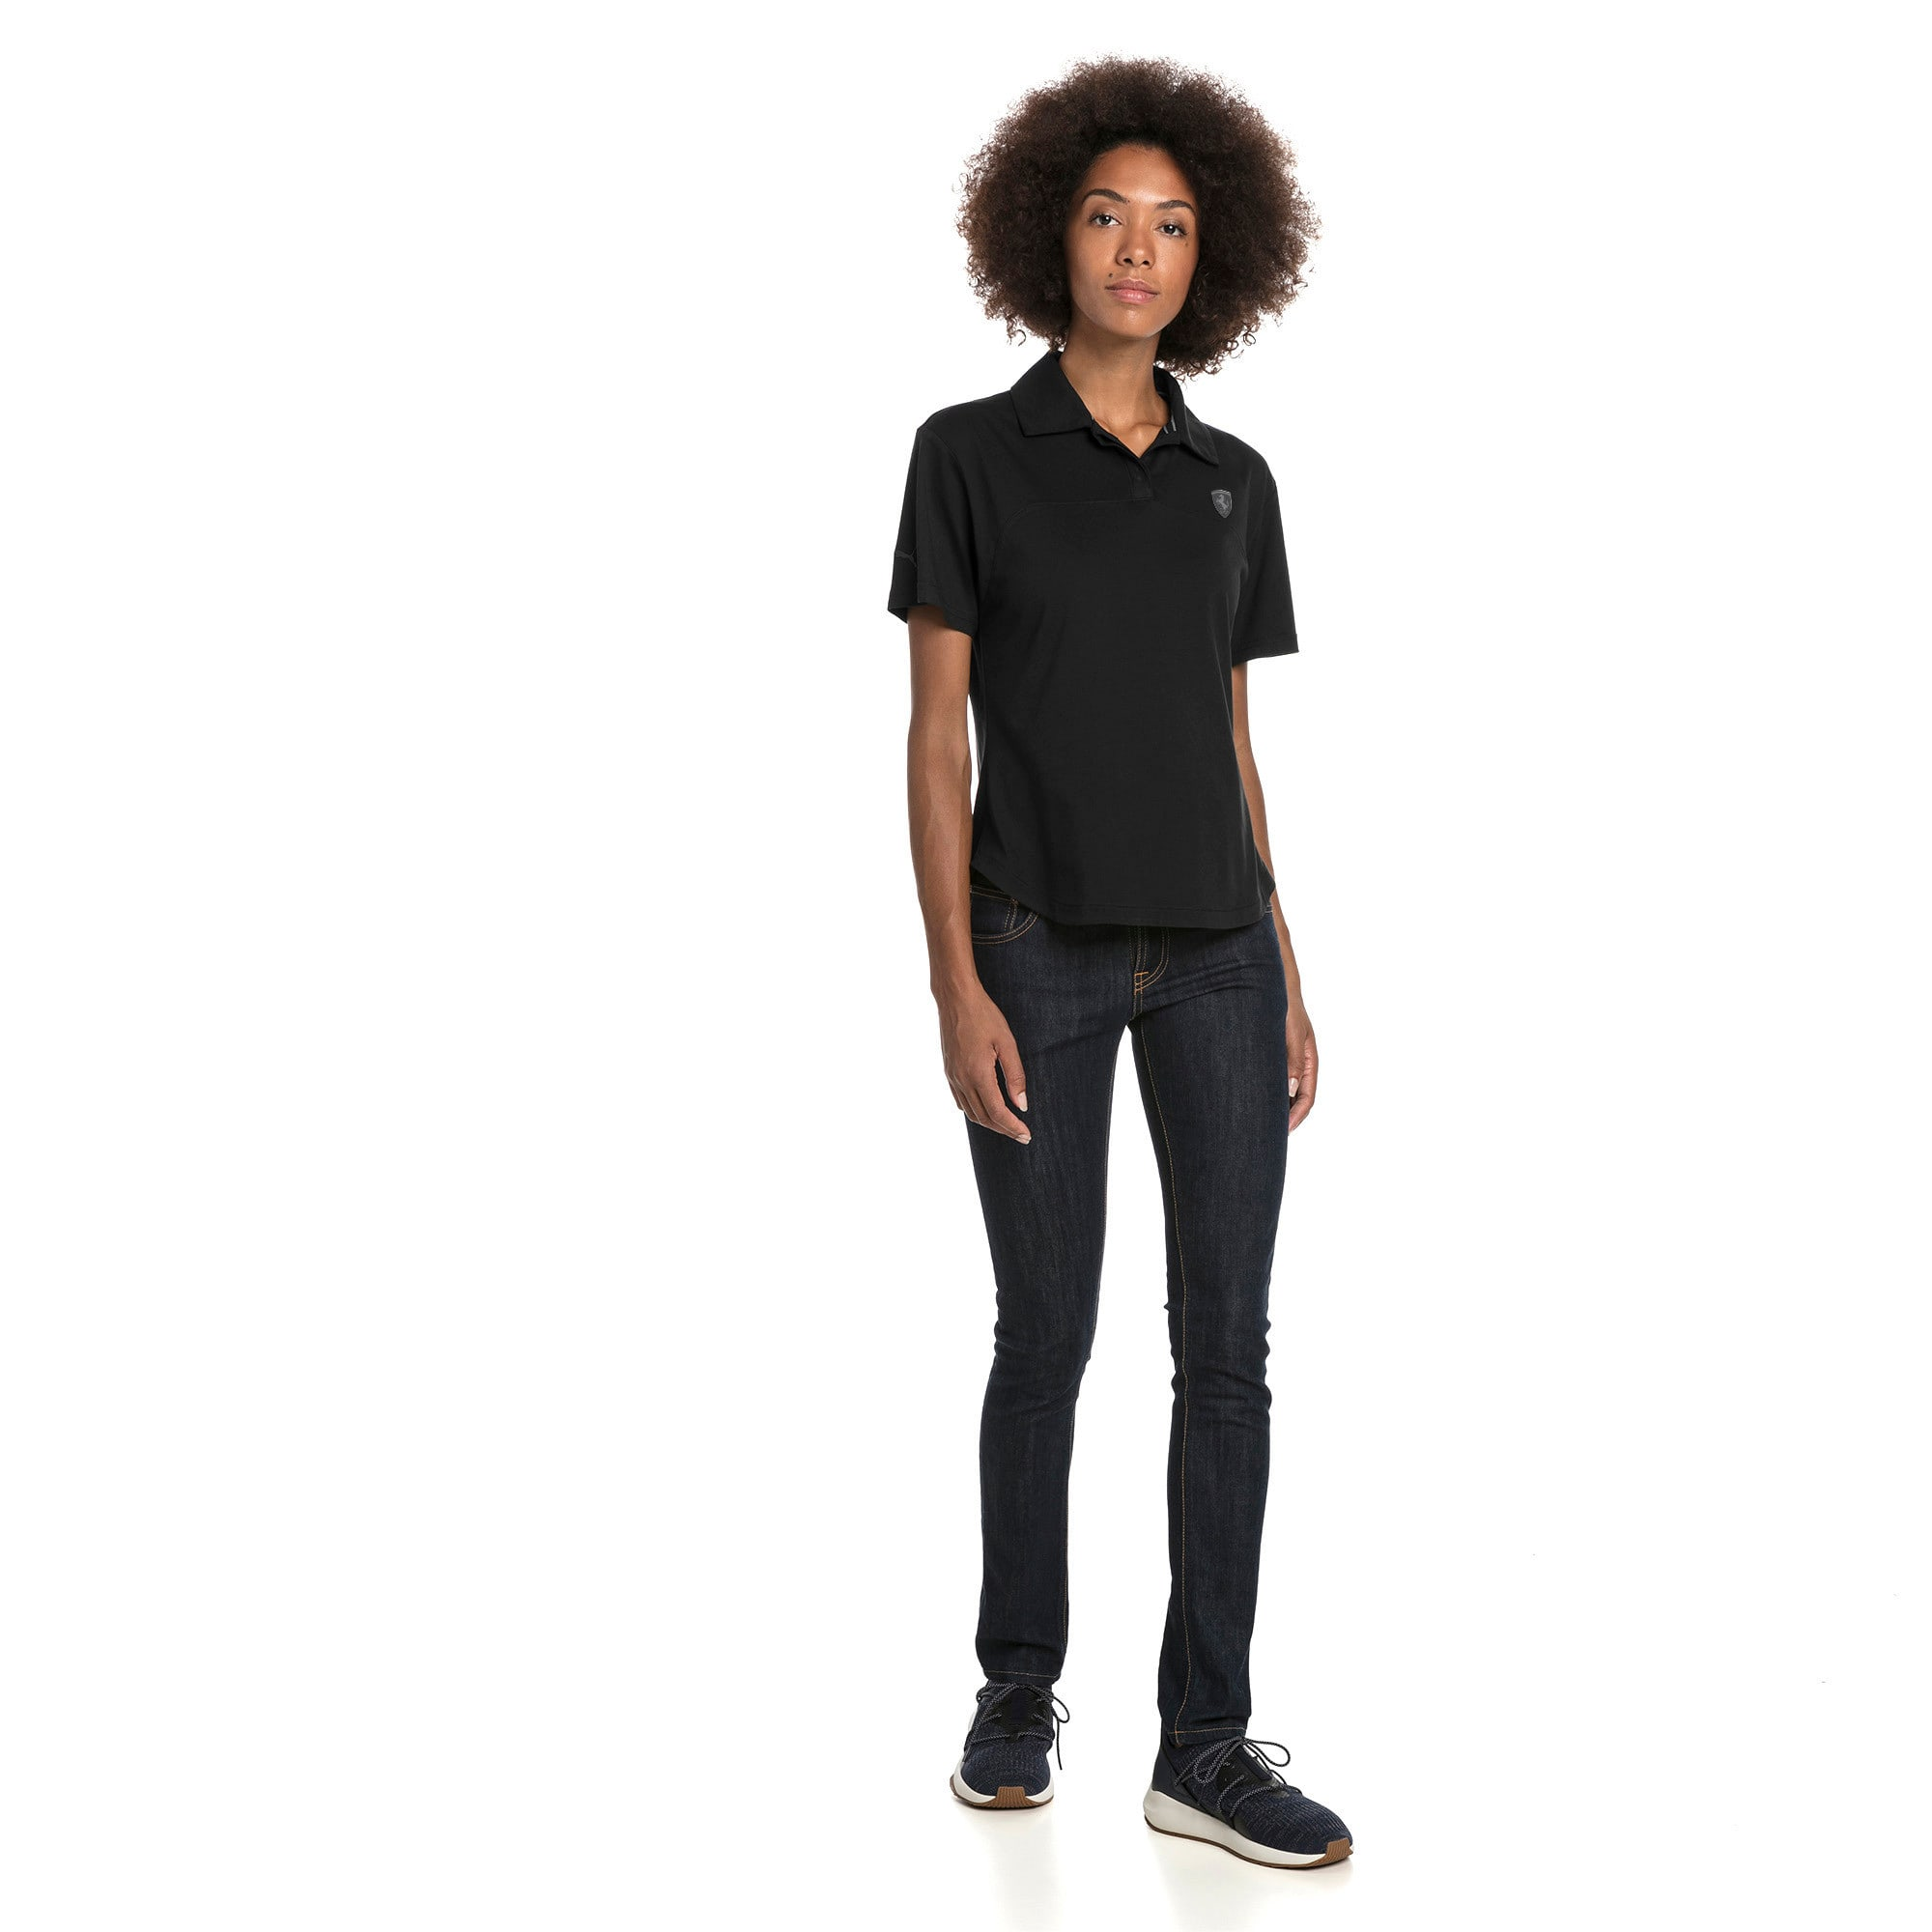 Miniatura 3 de Camiseta tipo polo Scuderia Ferrari para mujer, Puma Black, mediano